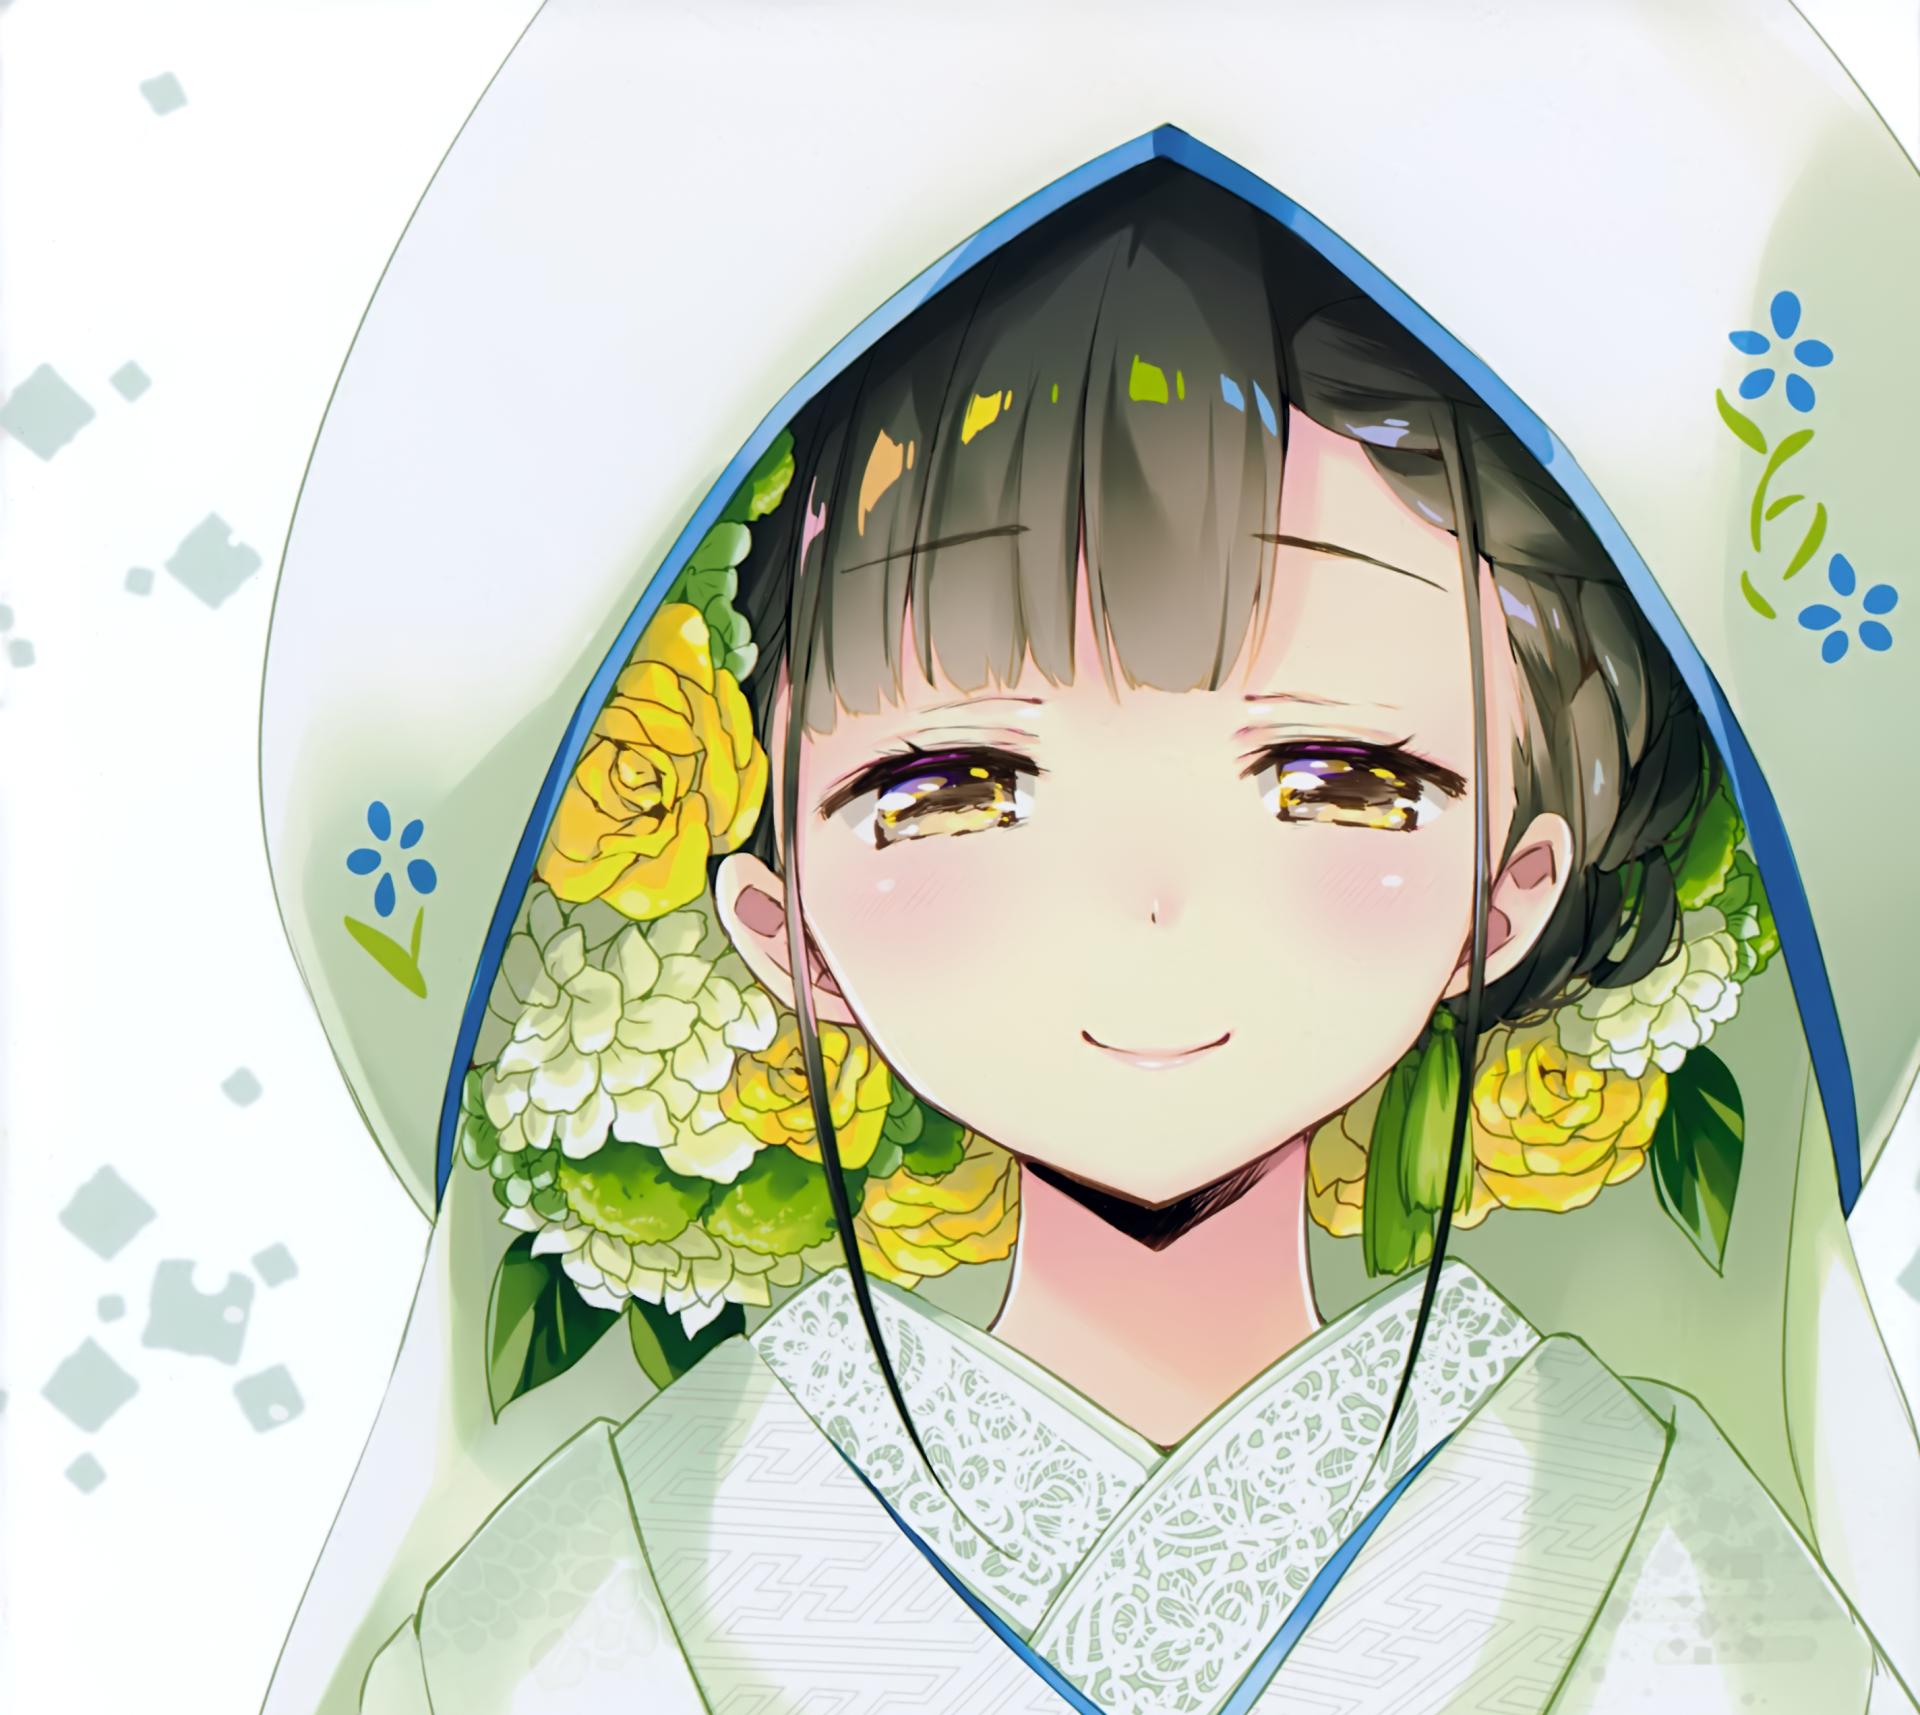 Anime - Original  Smile Flower Braid Short Hair Black Hair Yellow Eyes Kimono Hood Wallpaper